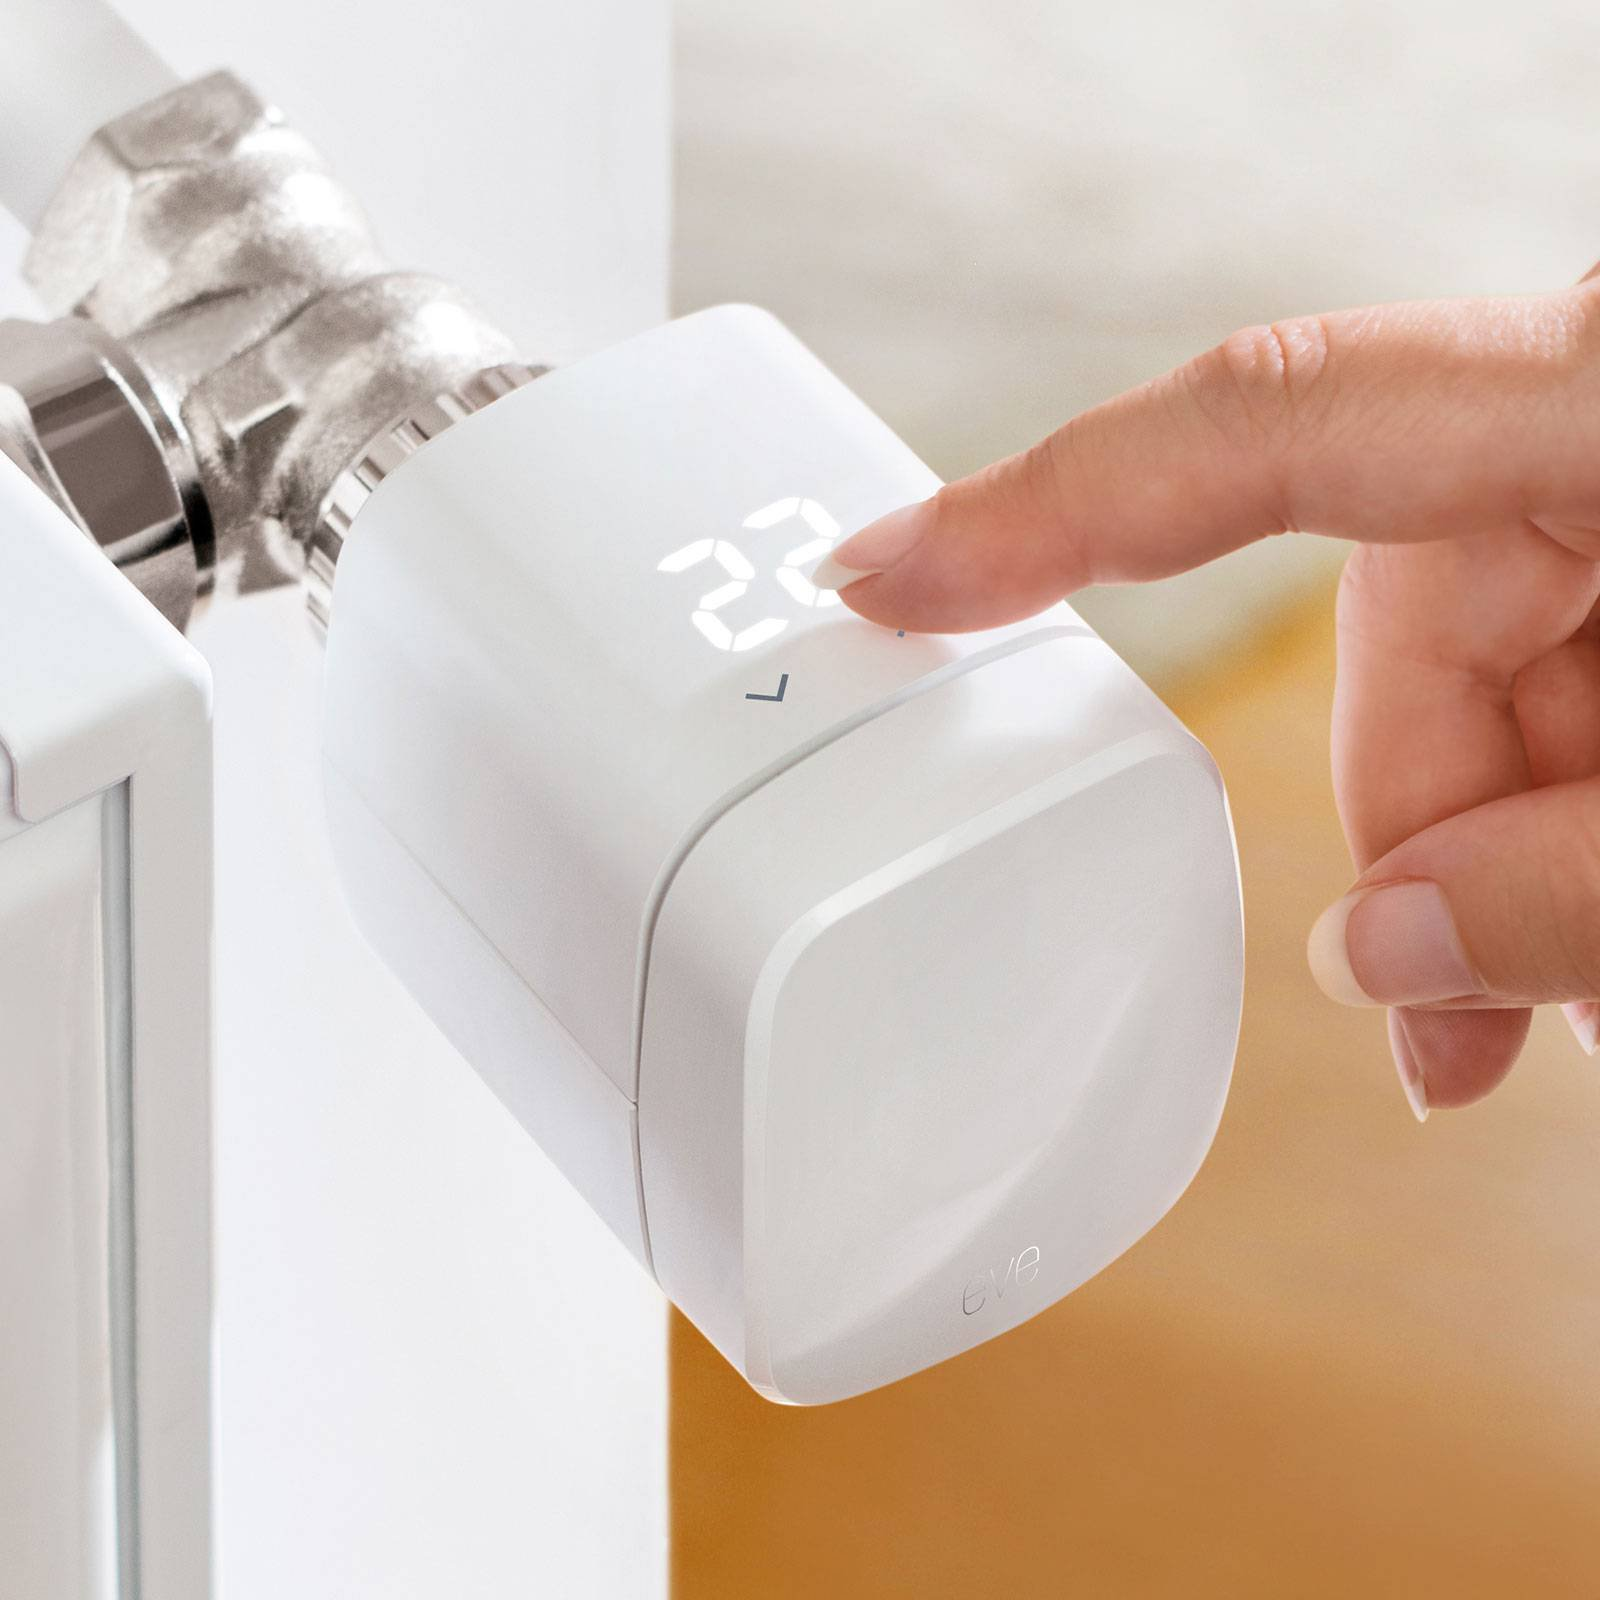 Eve Thermo Smart Home varmeovntermostat